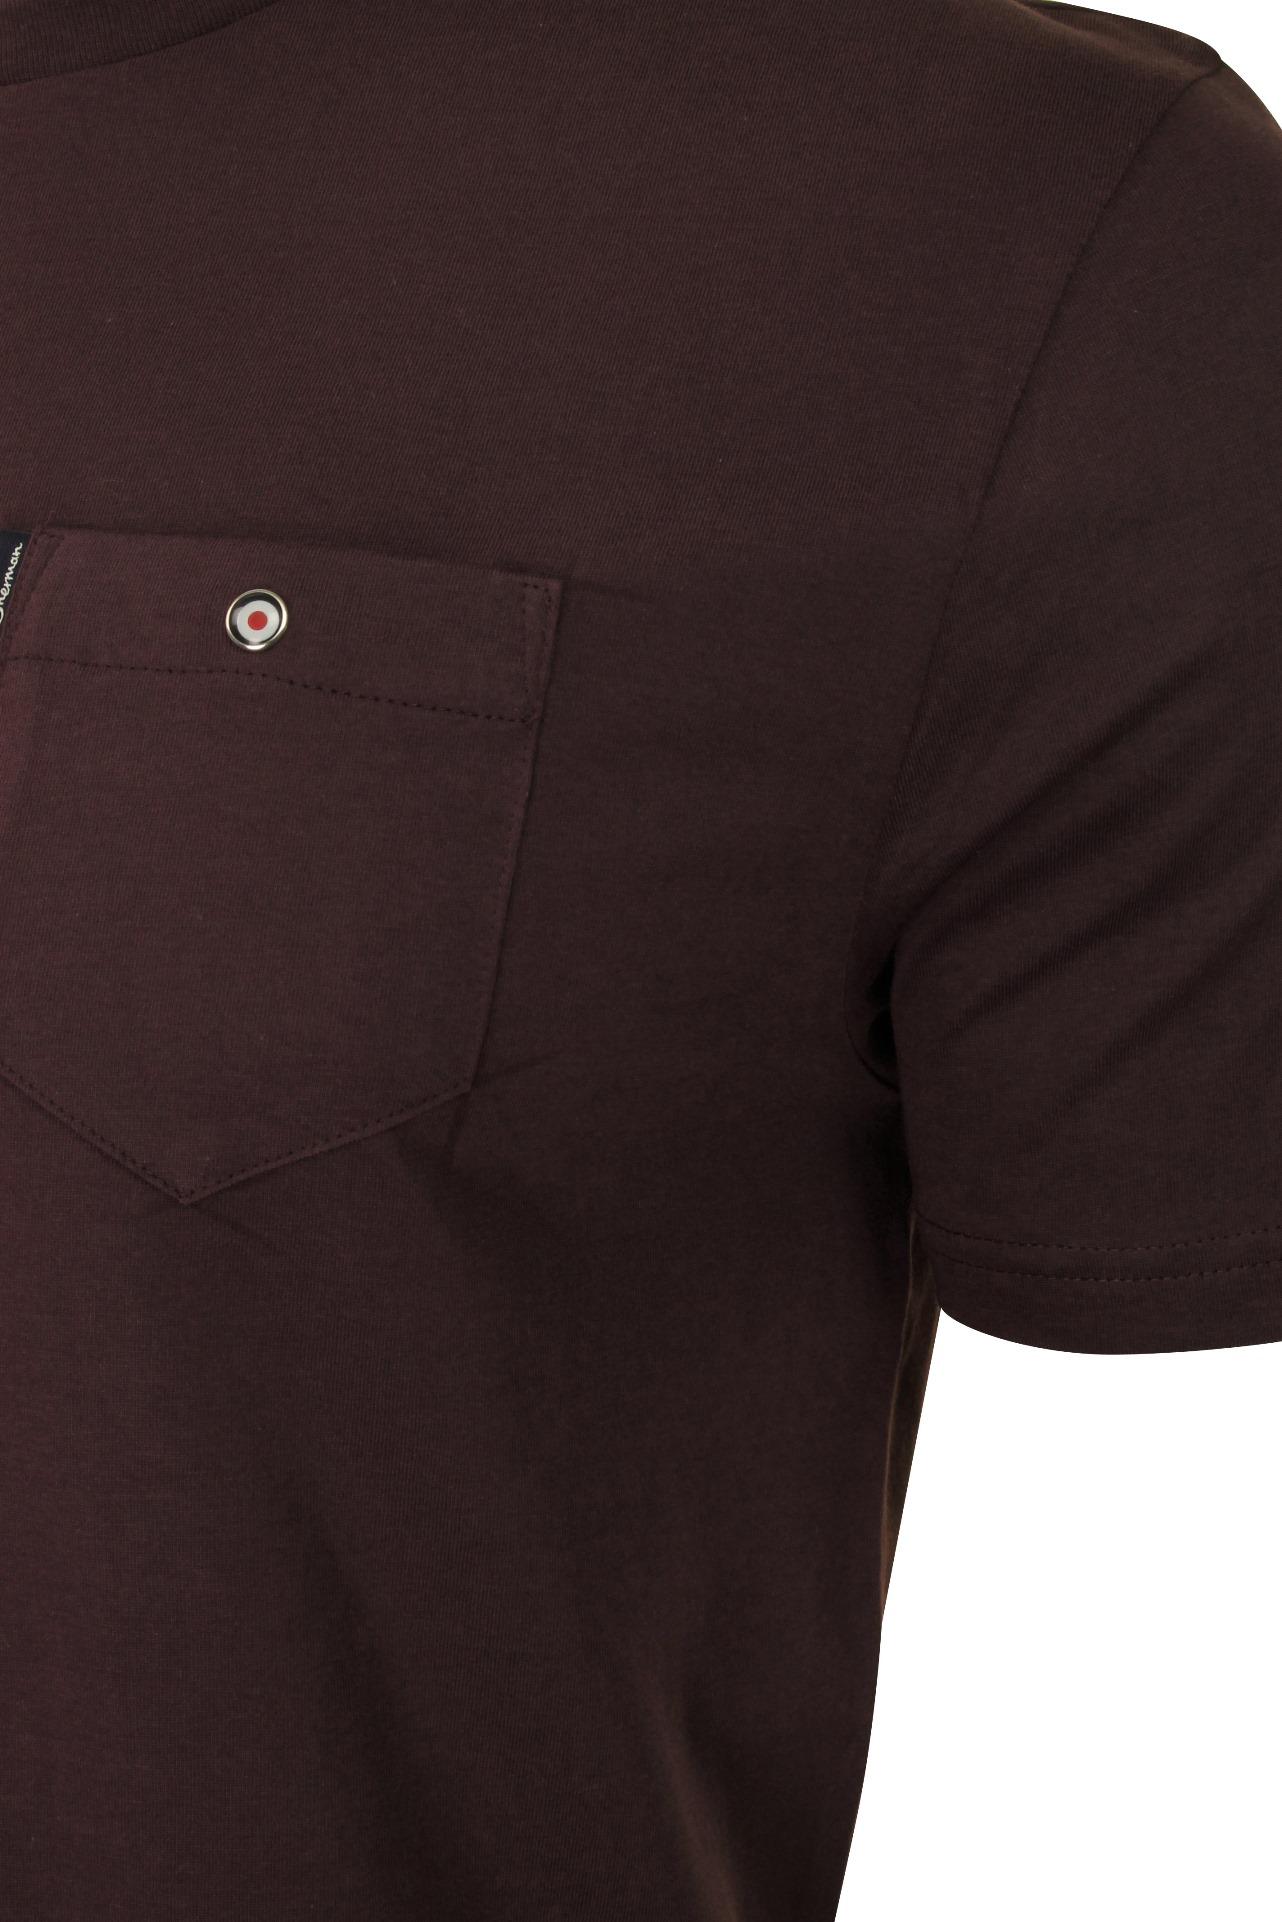 Mens-Classic-Spade-Pocket-T-Shirt-by-Ben-Sherman thumbnail 9